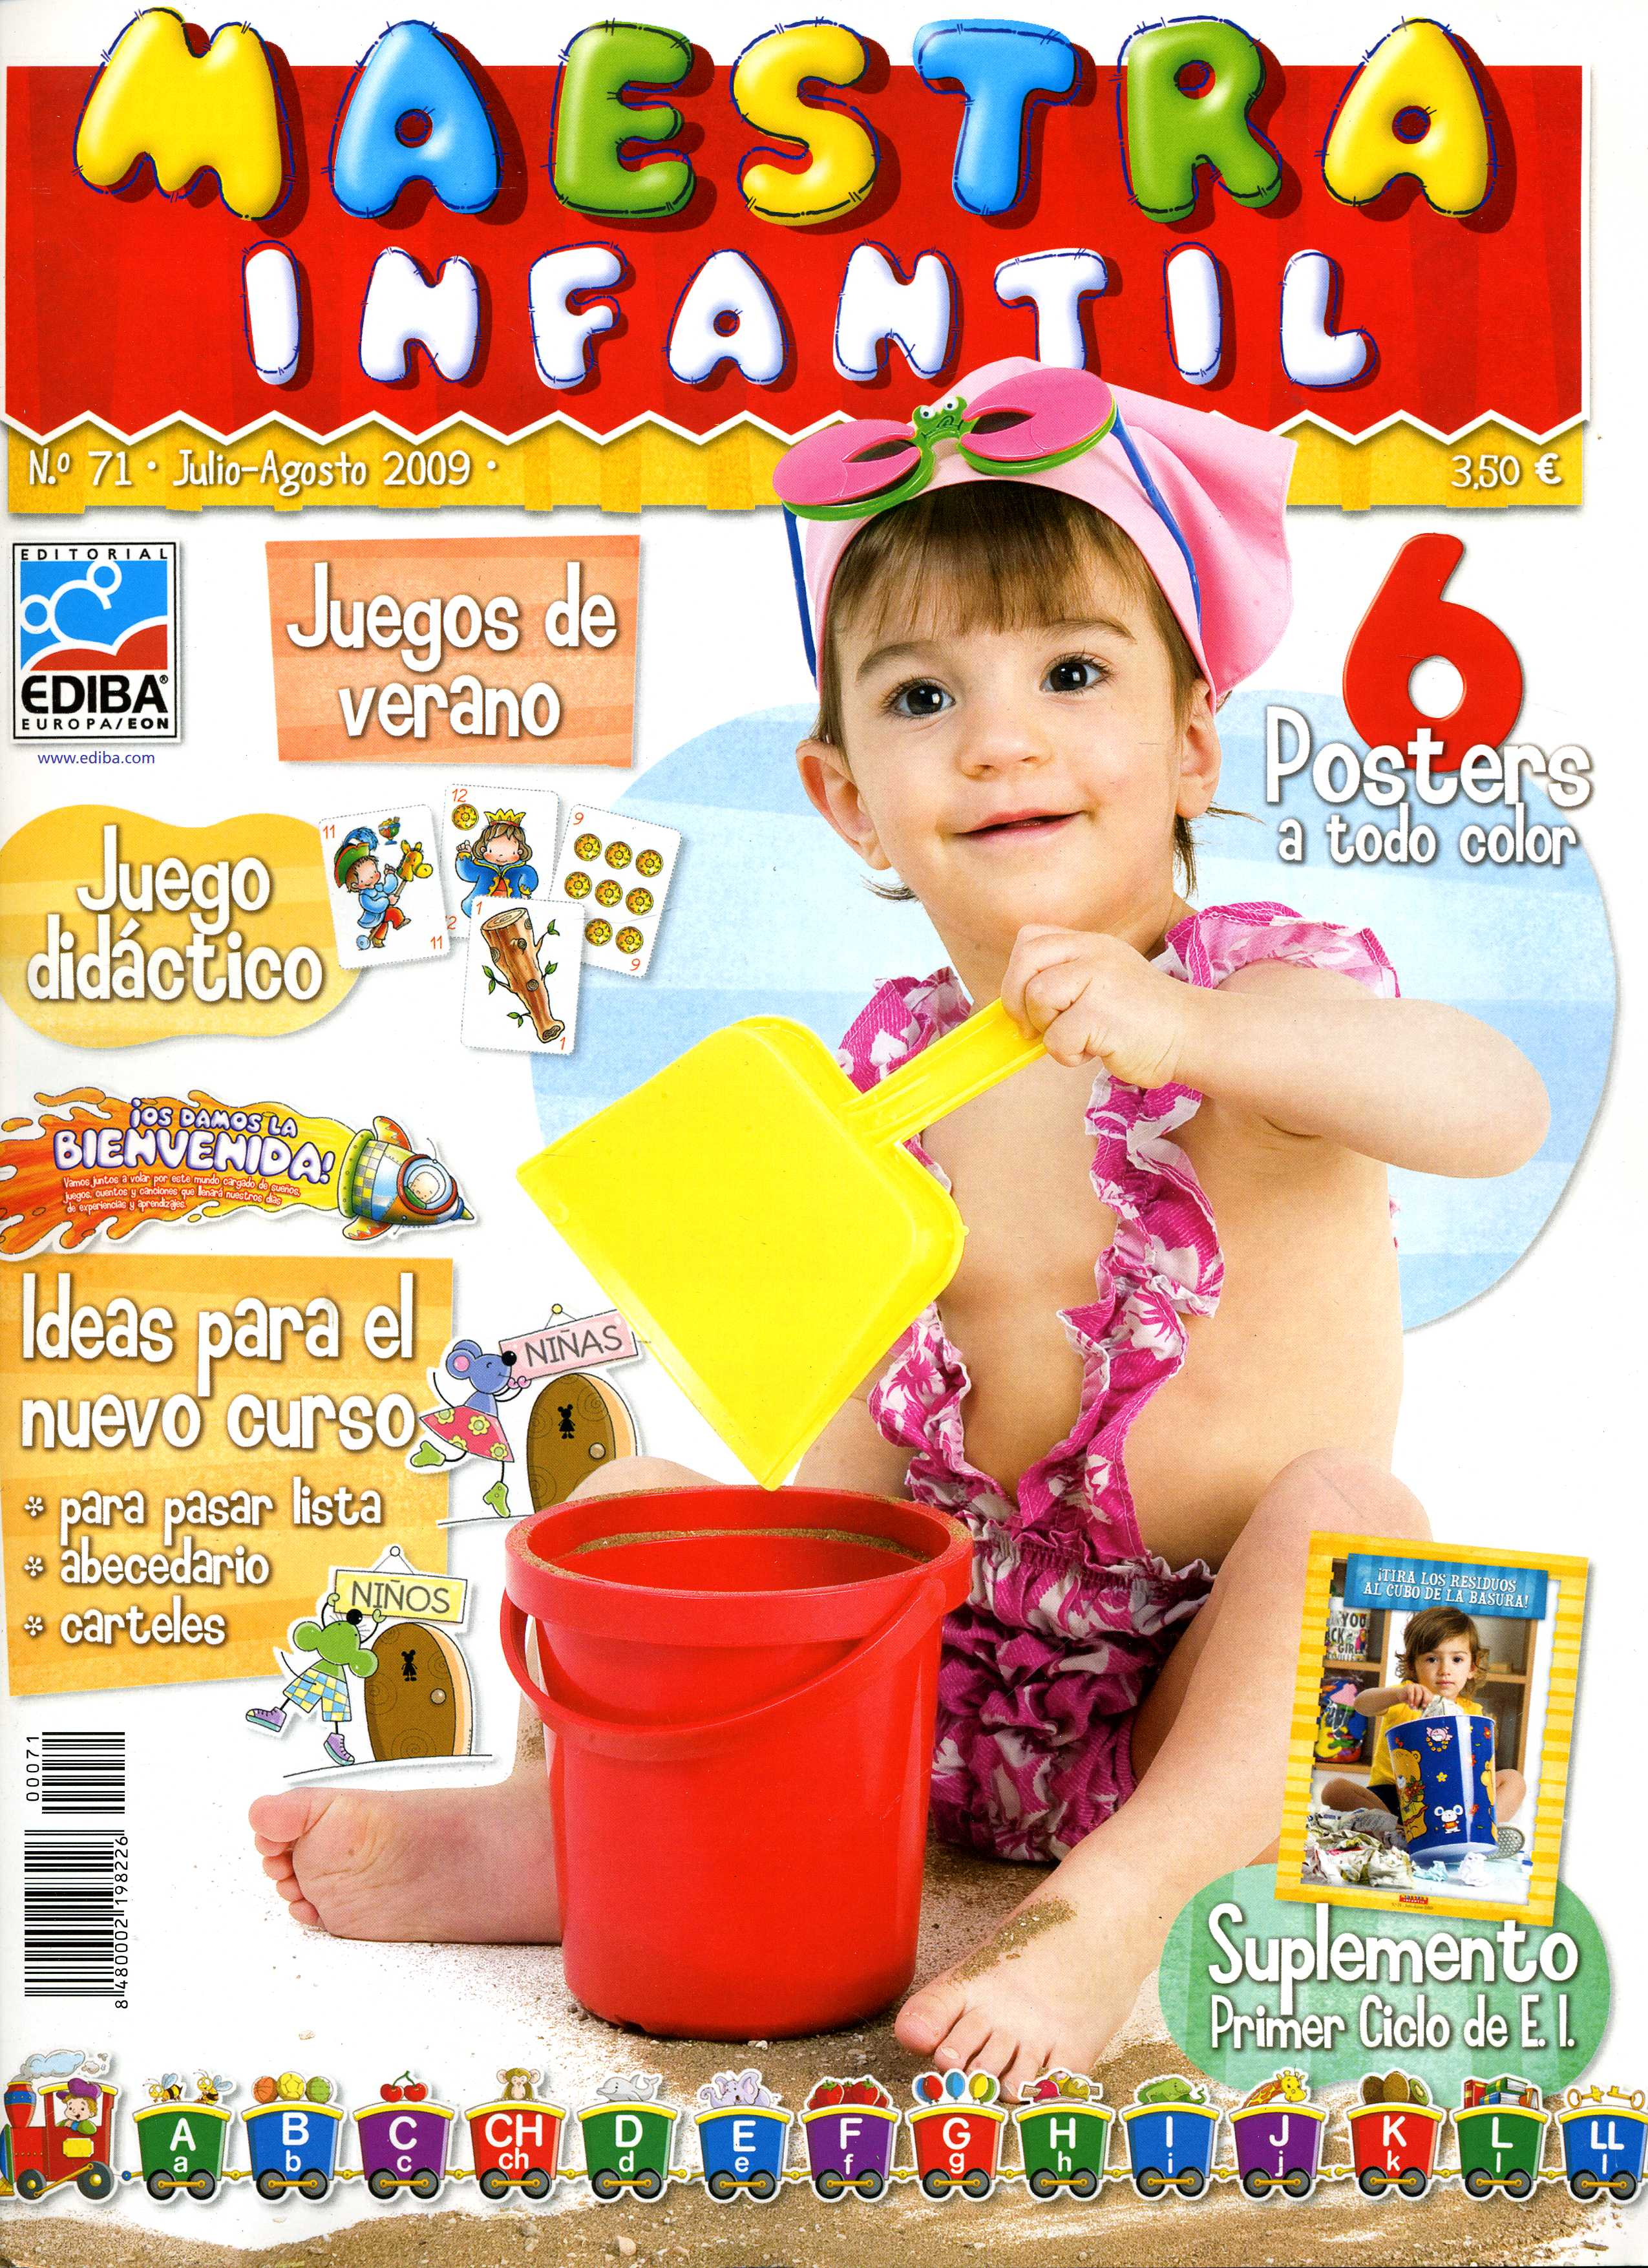 MAESTRA INFANTIL, 71 (Julio-Agosto de 2009)